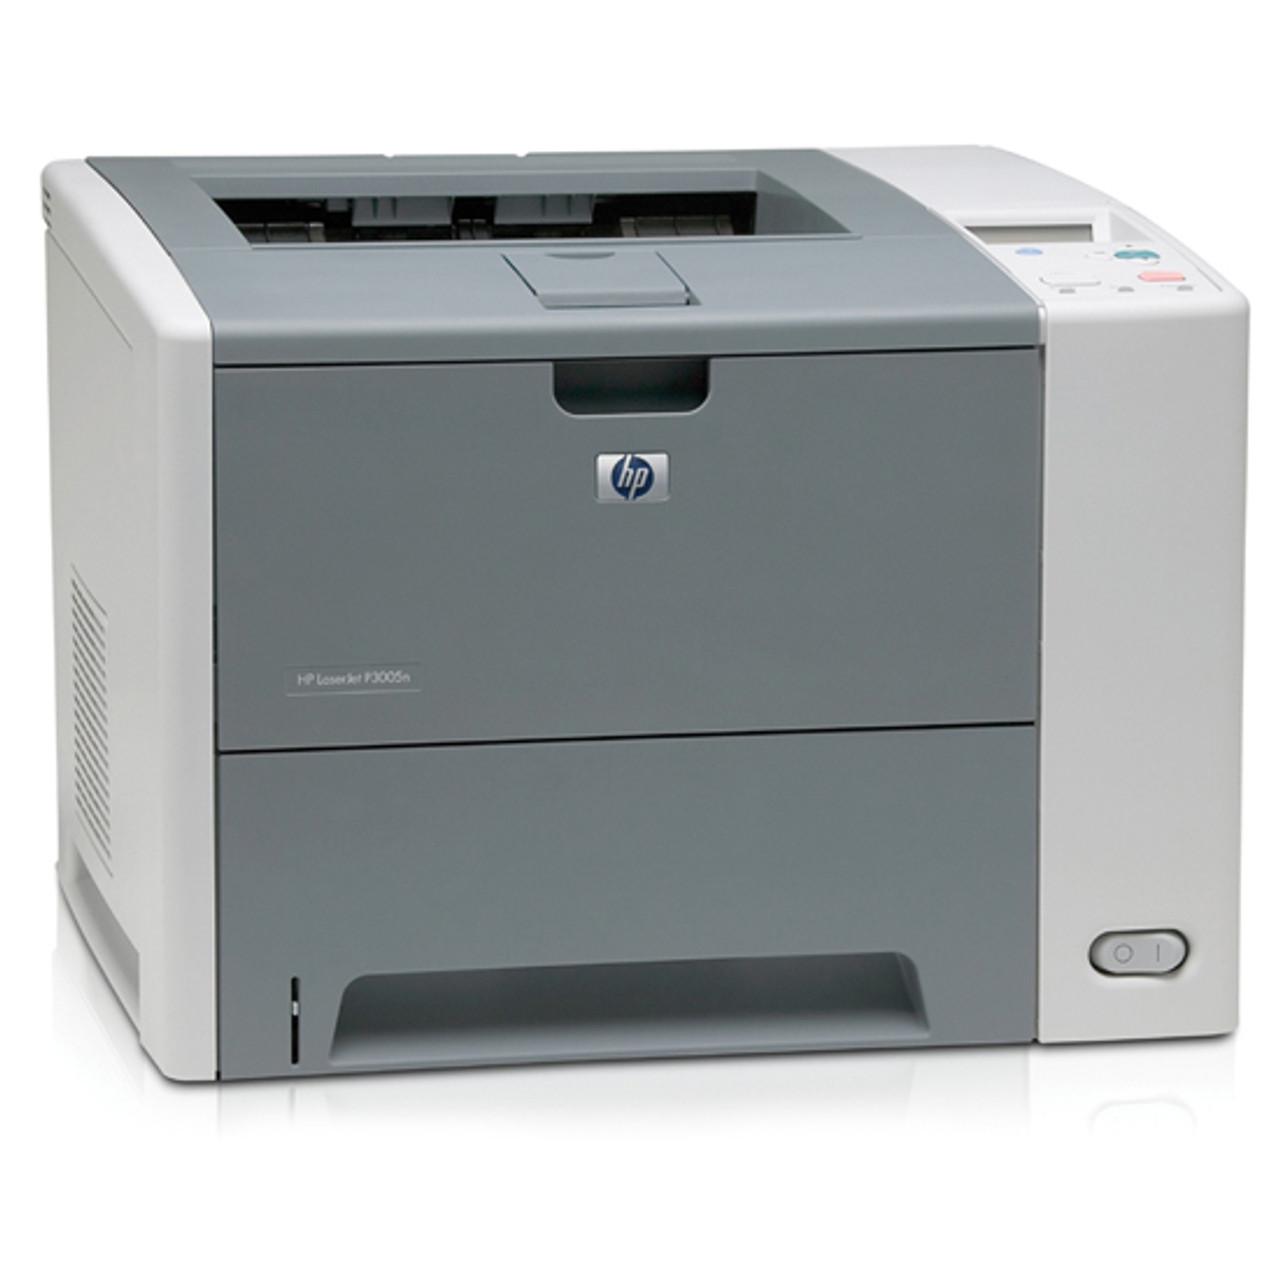 HP LaserJet P3005d - Q7813A - HP Laser Printer for sale